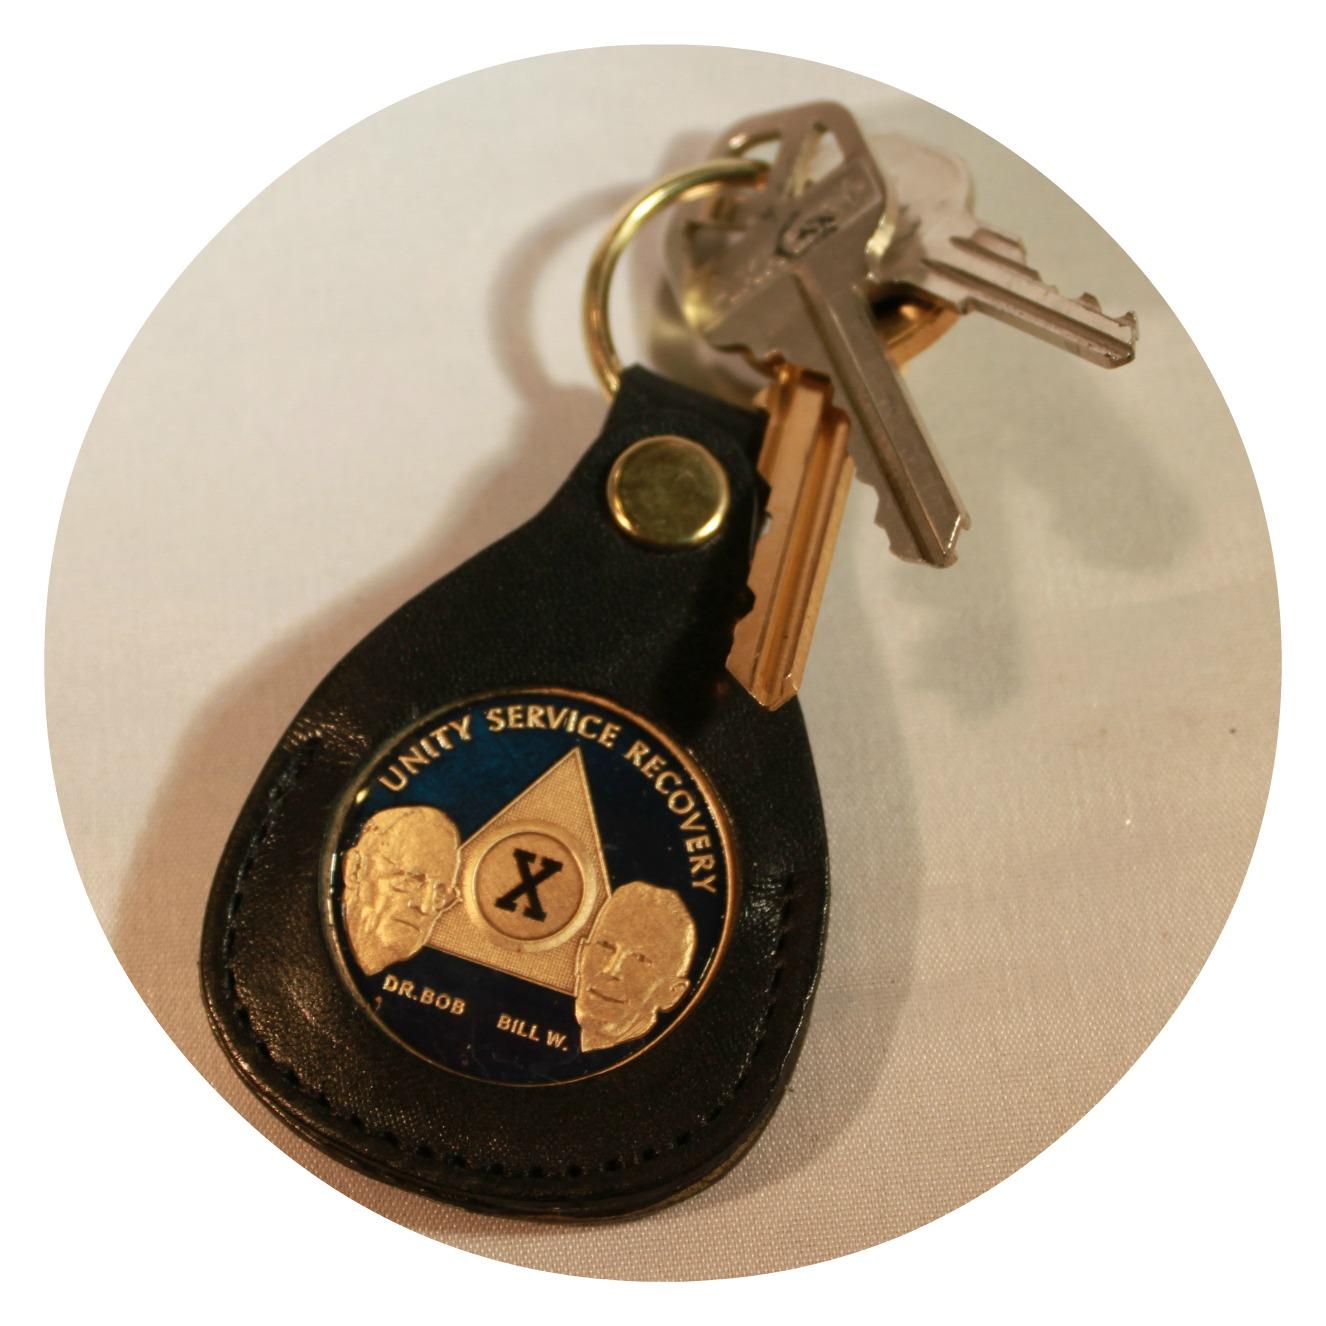 AAA Leather Key Tag